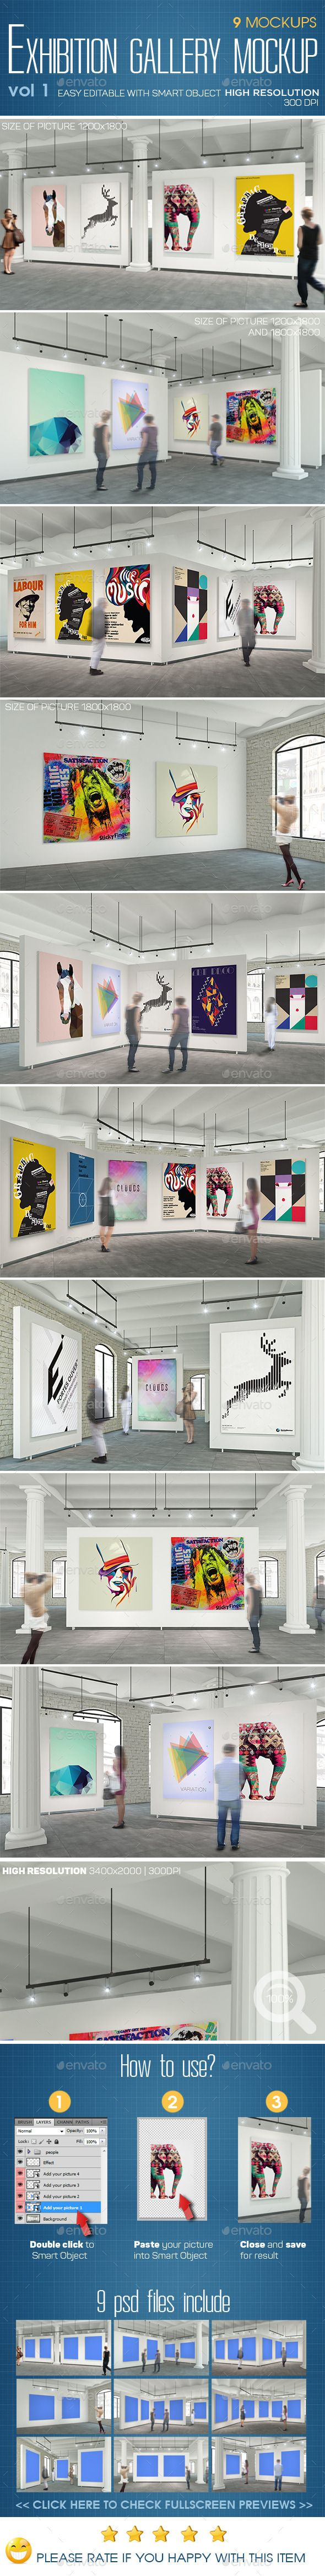 Exhibition Gallery Mockup #design Download: http://graphicriver.net/item/exhibition-gallery-mockup-v1/11686006?ref=ksioks